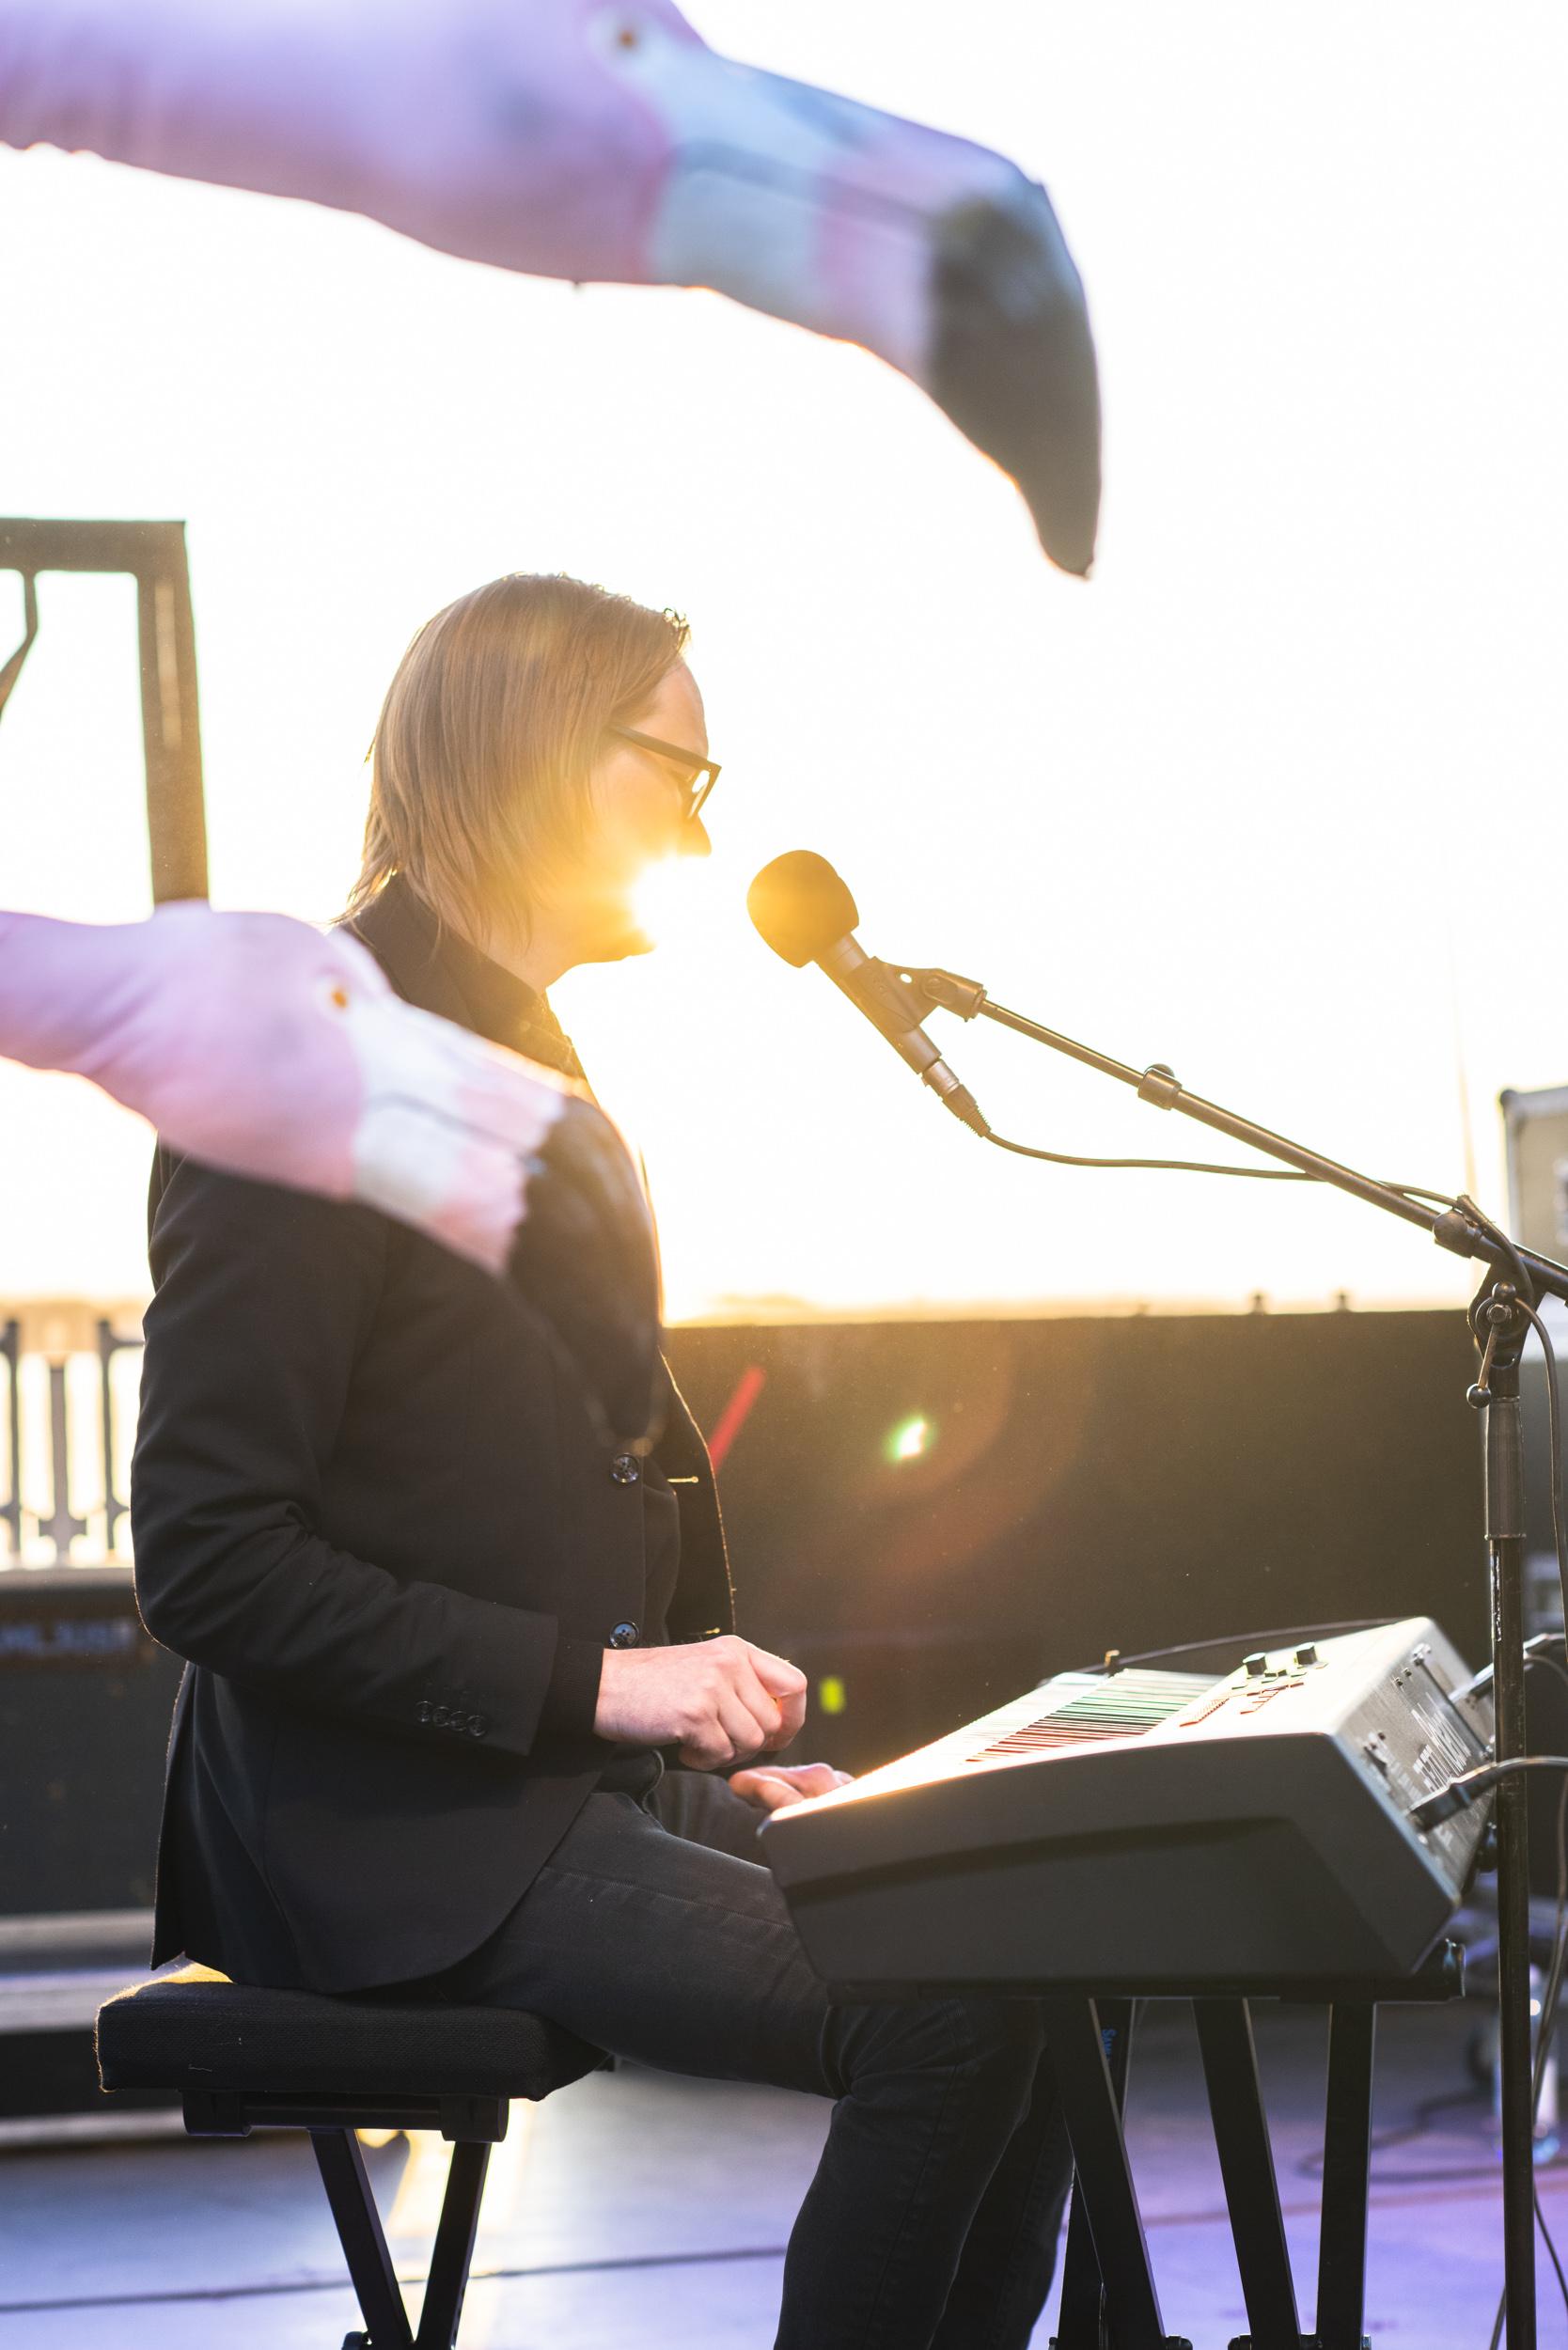 Matti Ollikainen sjunger i solnedgången. Musikens Makt 2019.